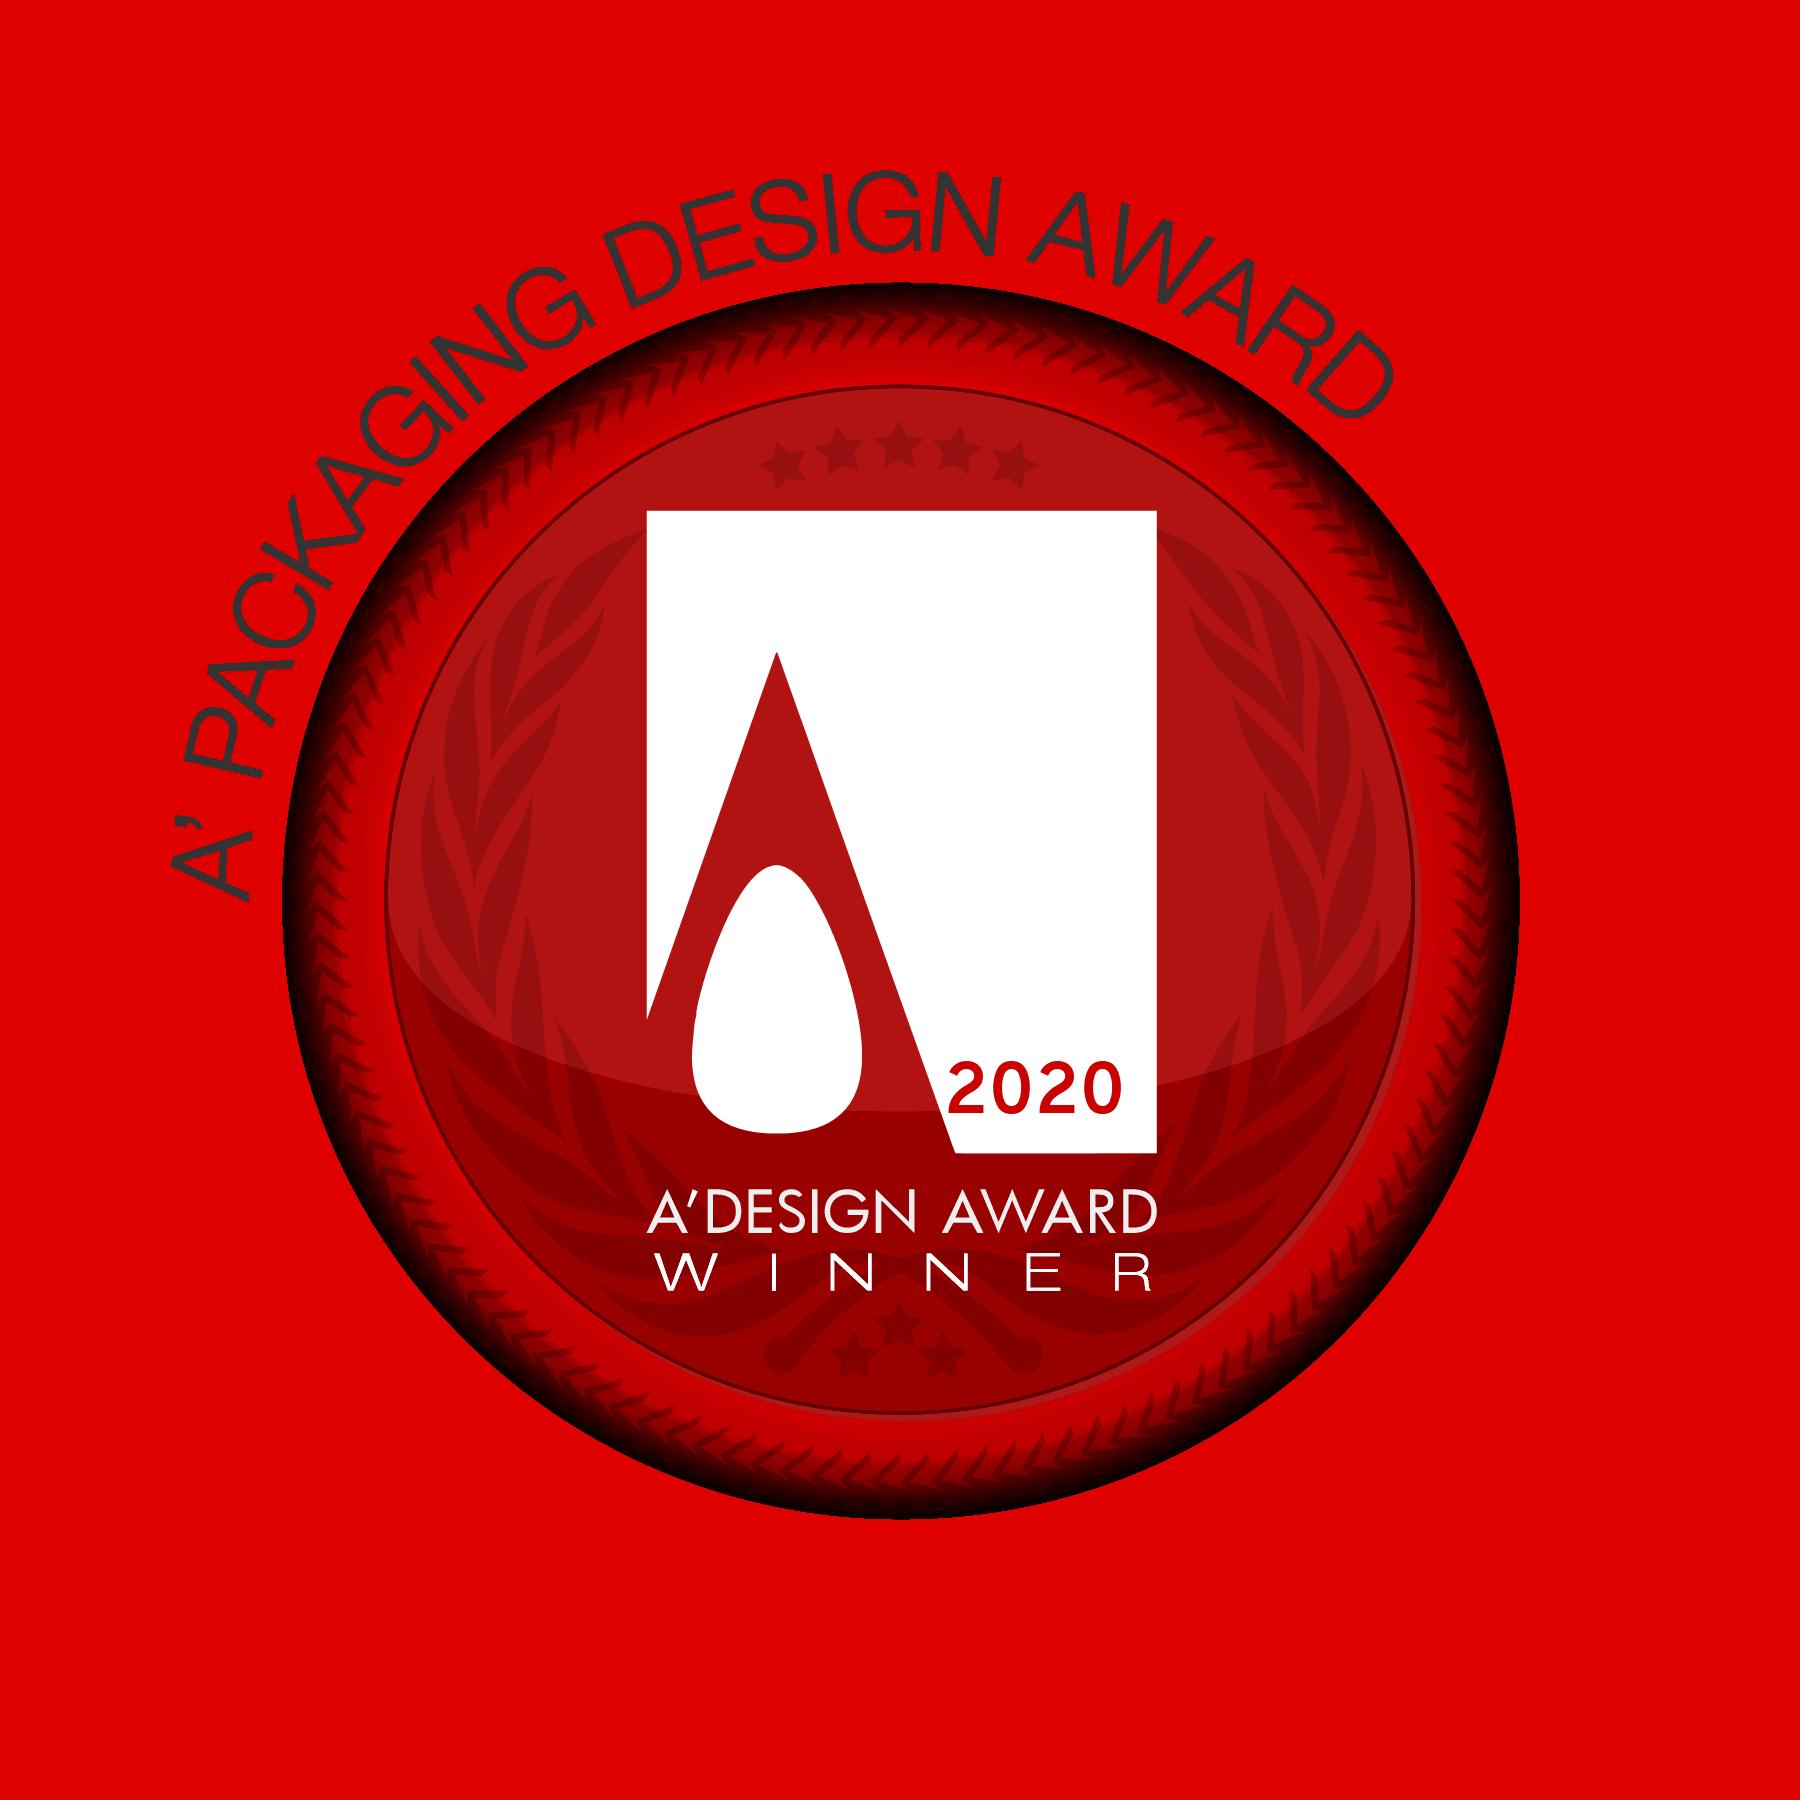 A'Design